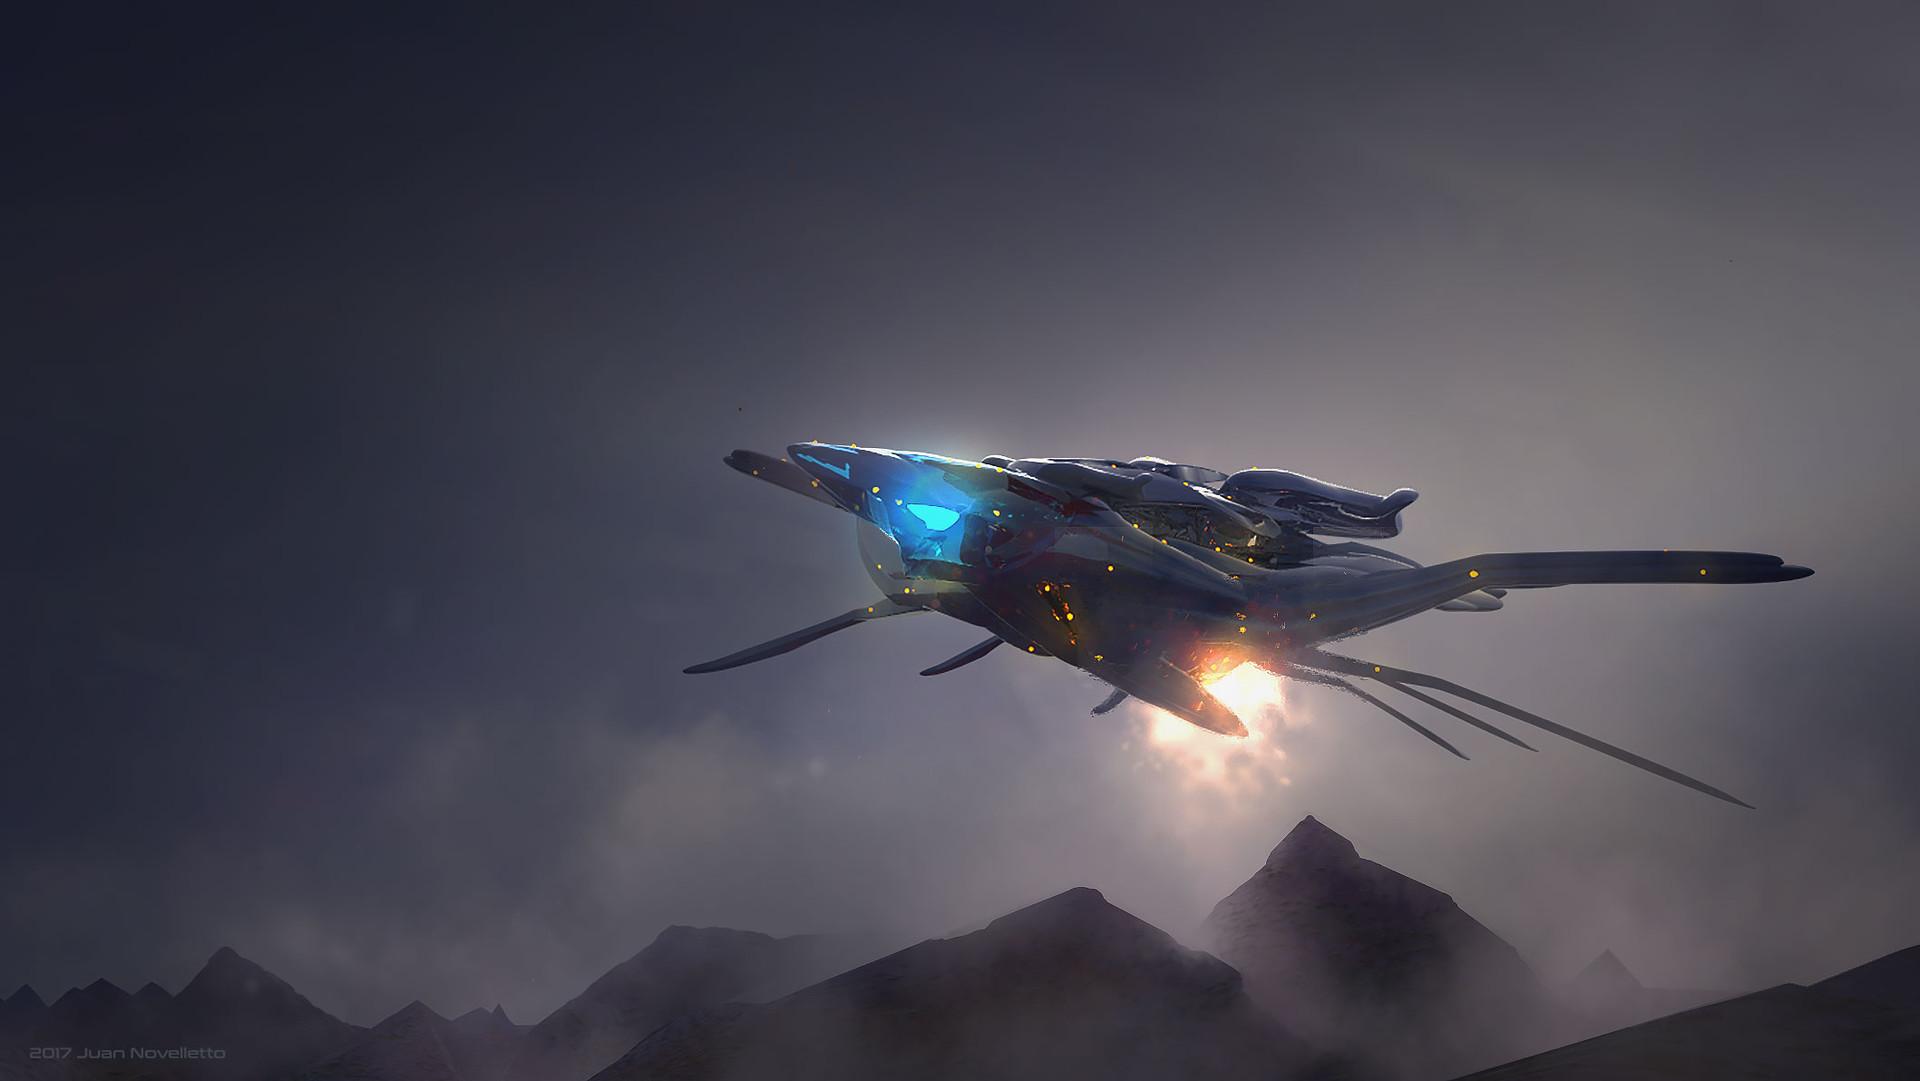 Juan novelletto alien ship02b